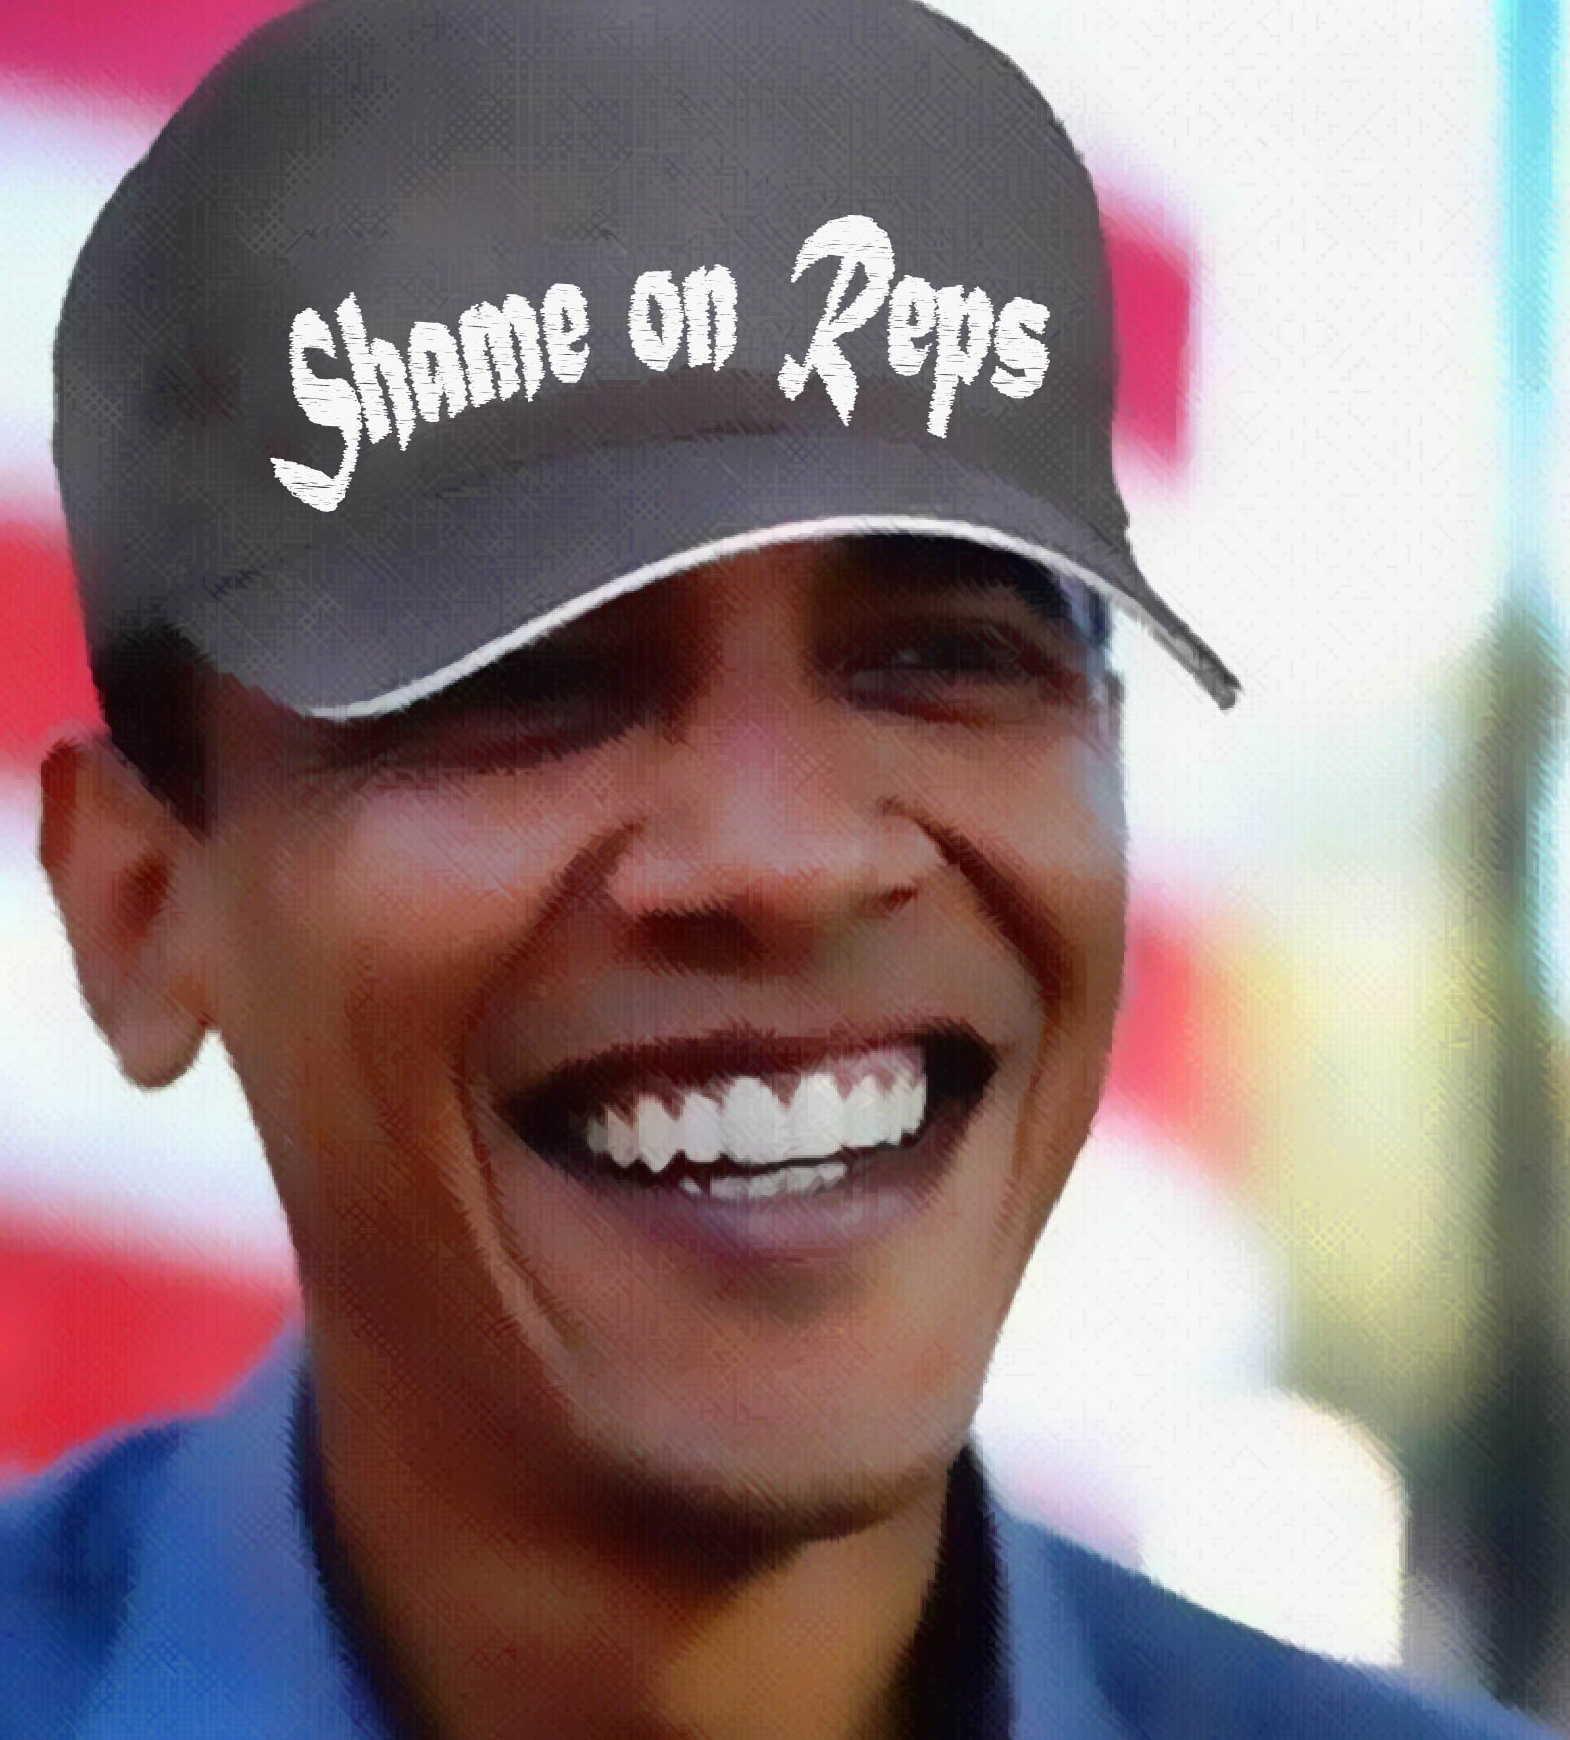 White House down, Obama mit Reps Hate Cap im Urlaub gesichtet Barack Obama shame on Reps basecap qpress